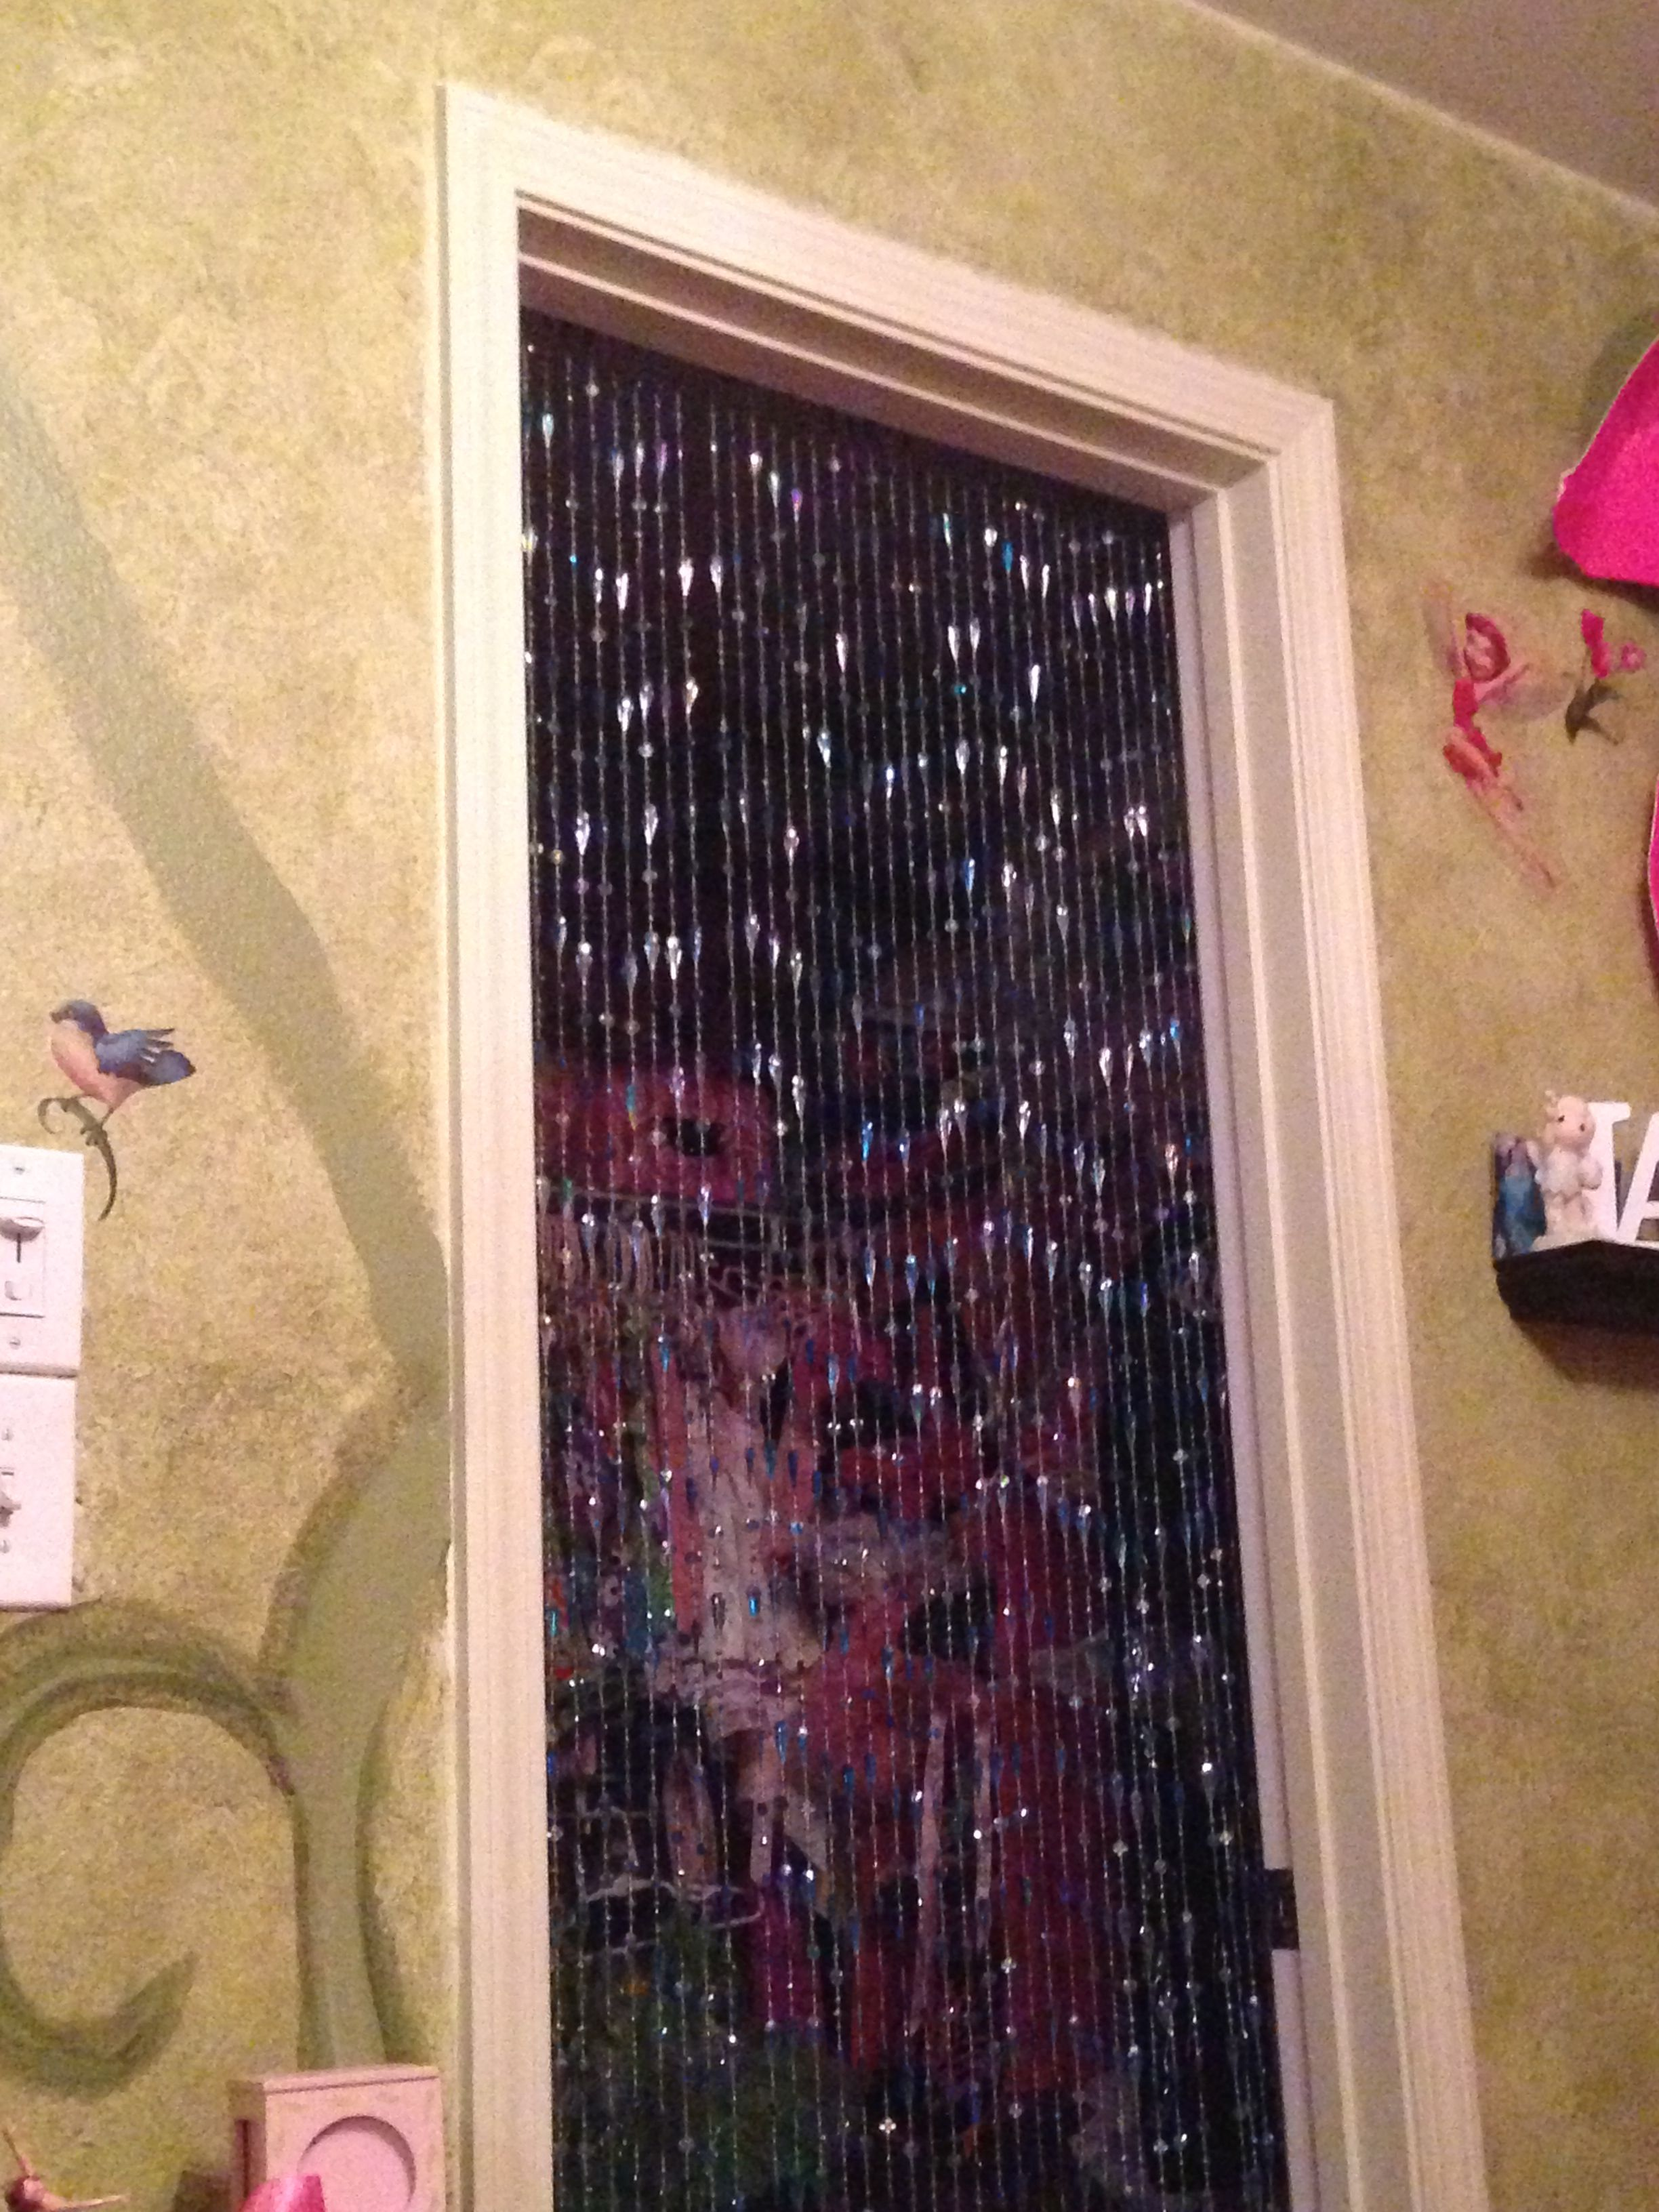 Bead Curtain As Closet Door For Little Girls Room My